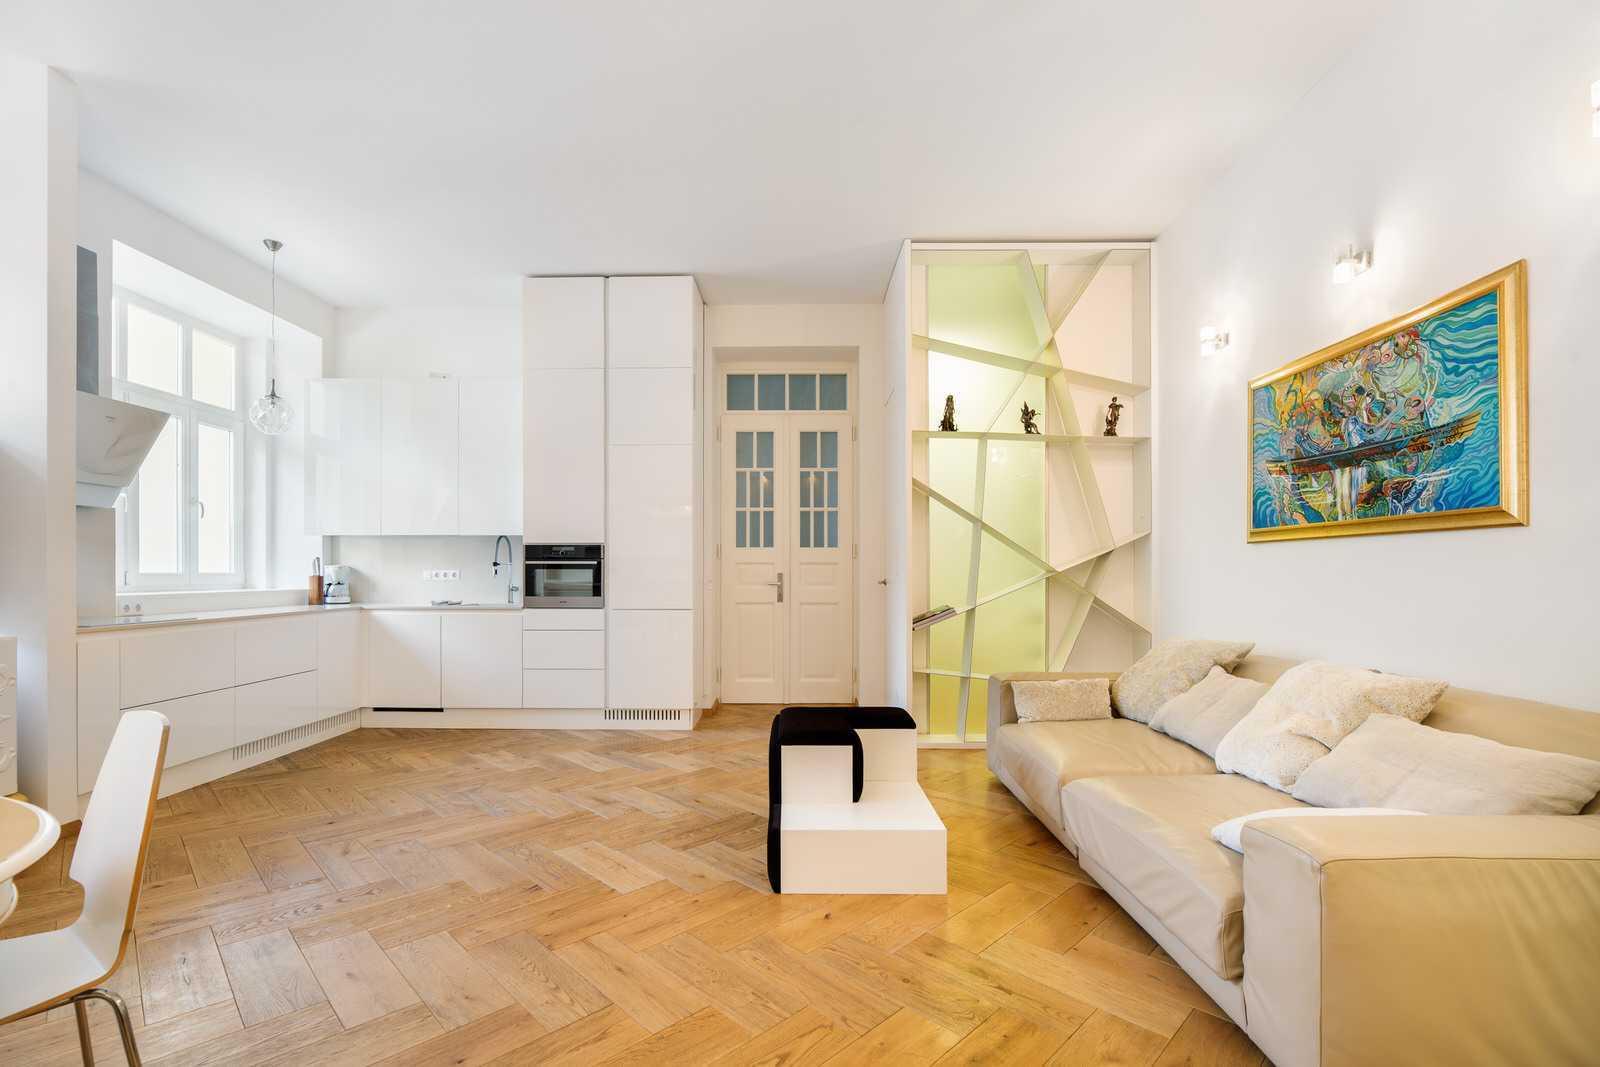 Ljubljana 2-bedroom Beethovnova apartment's big open space living room with kitchen